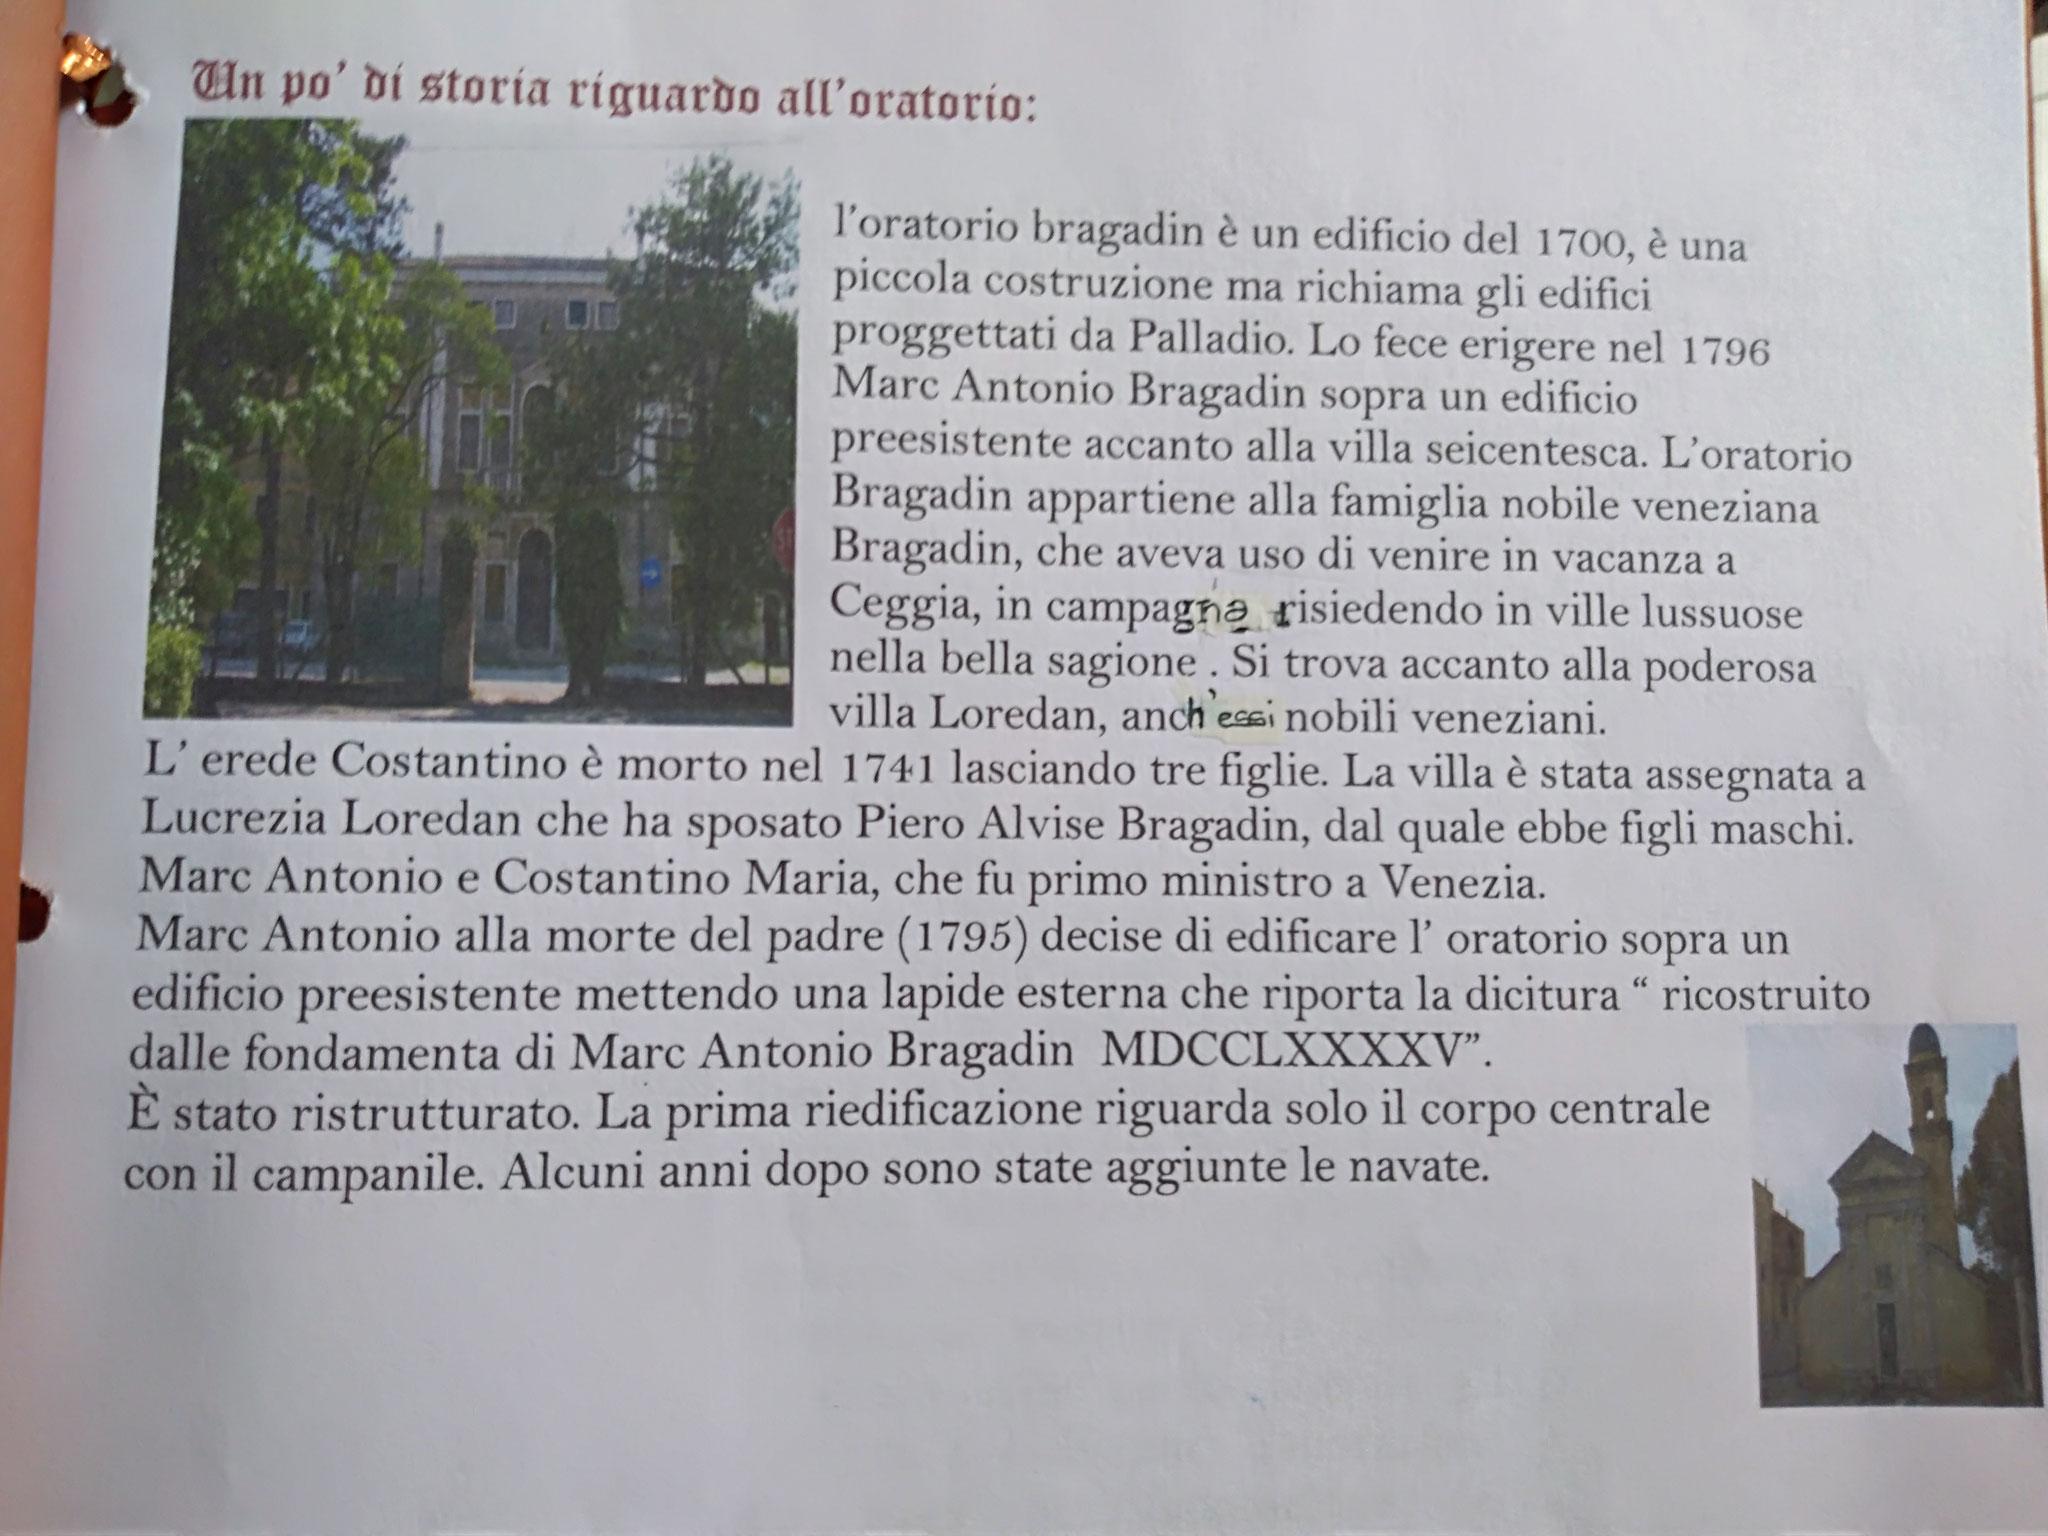 6  L'Oratorio Bragadin